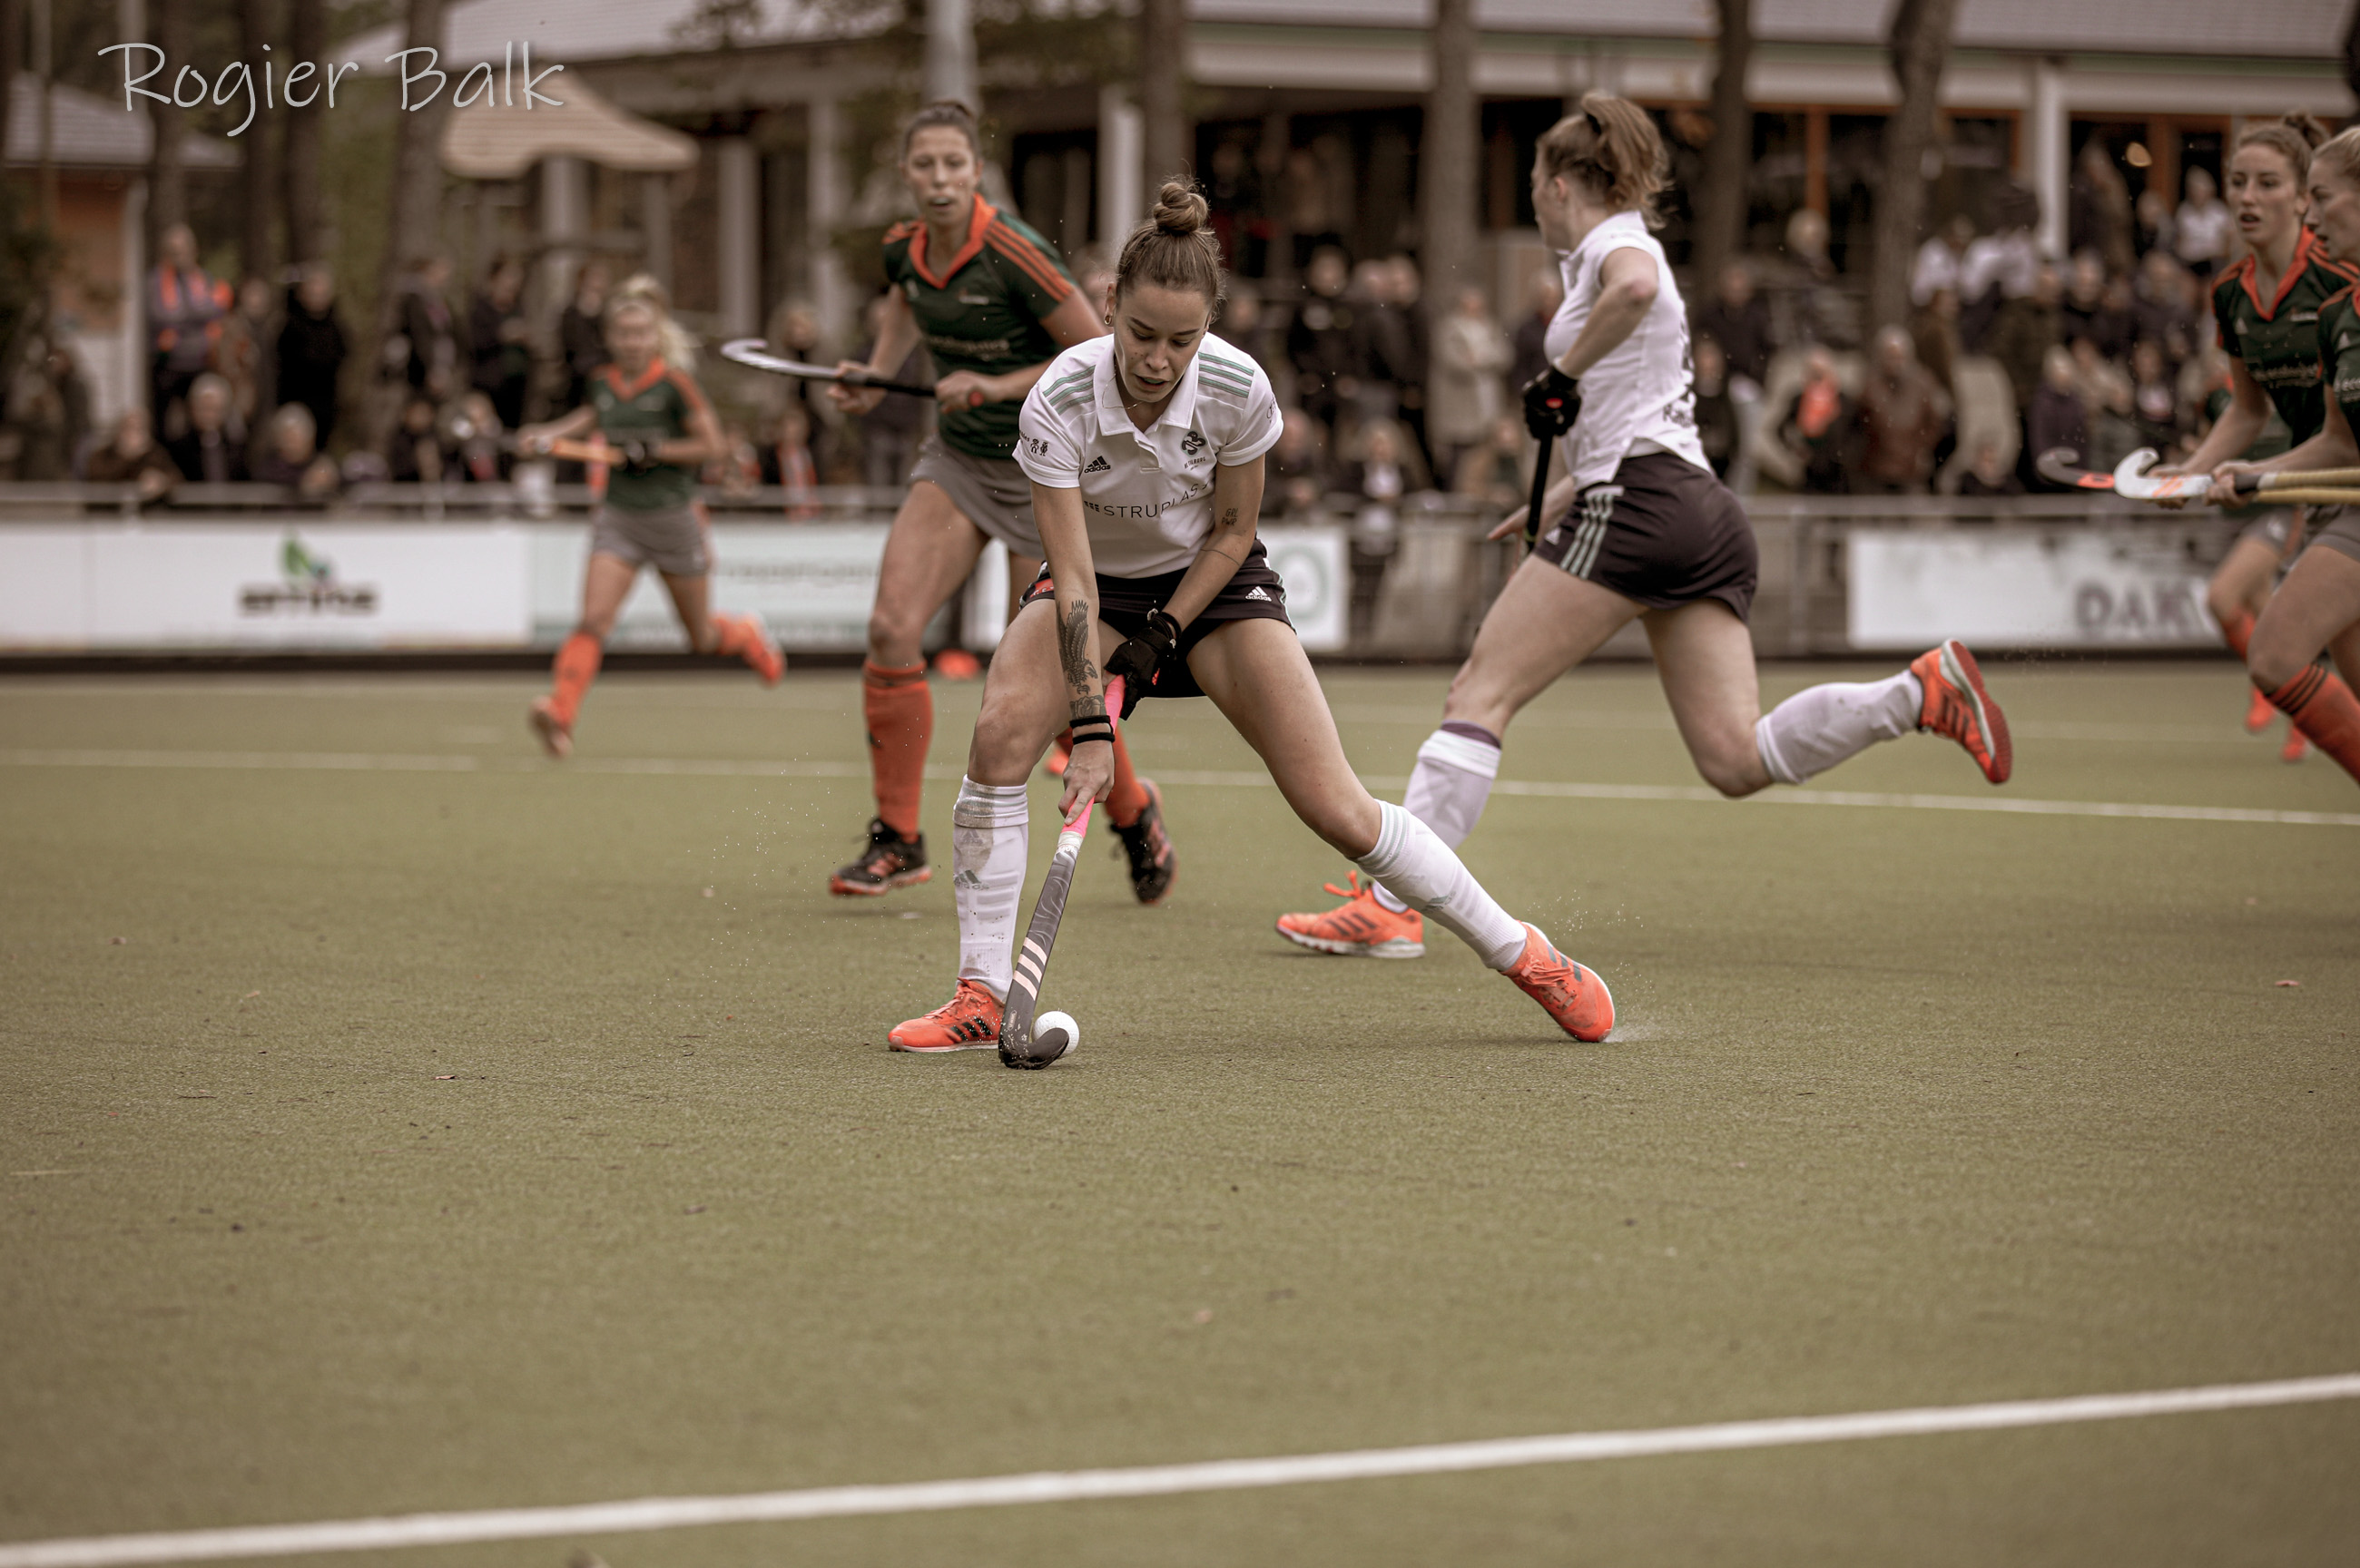 HC Tilburg, dames1, jeske v bavel, seiz19-20, weredi